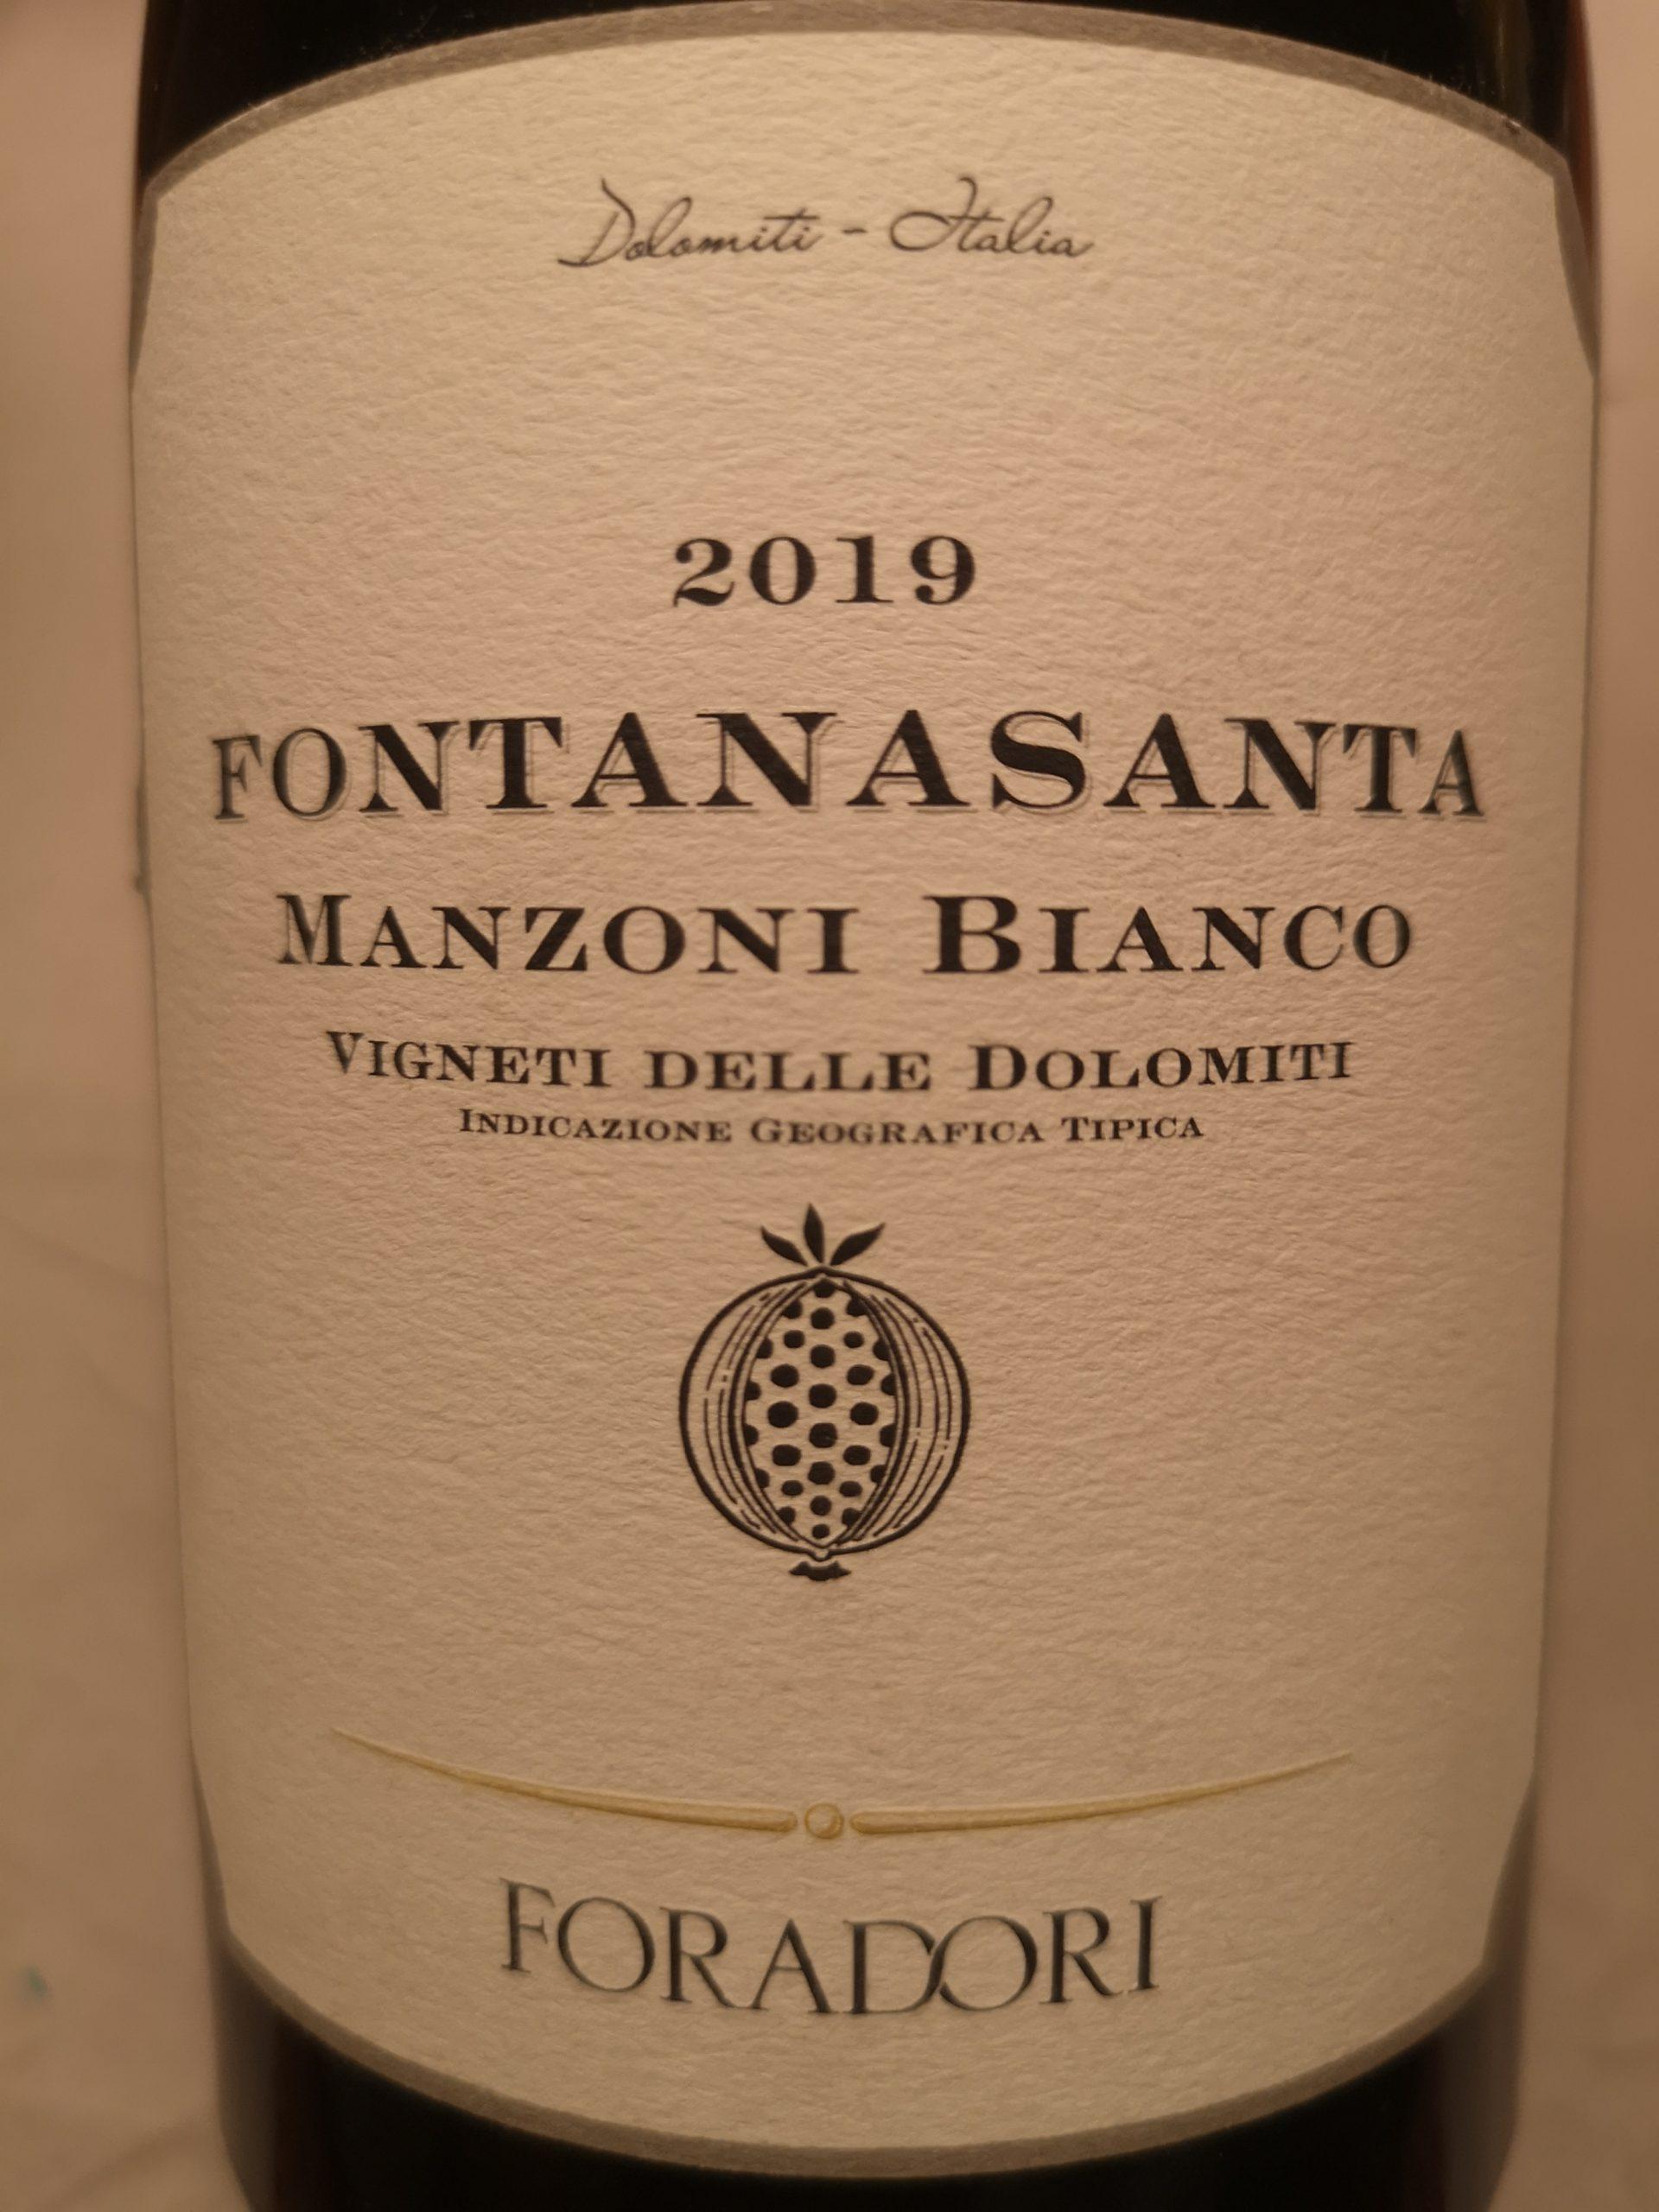 2019 Fontanasanta Manzoni Bianco   Foradori